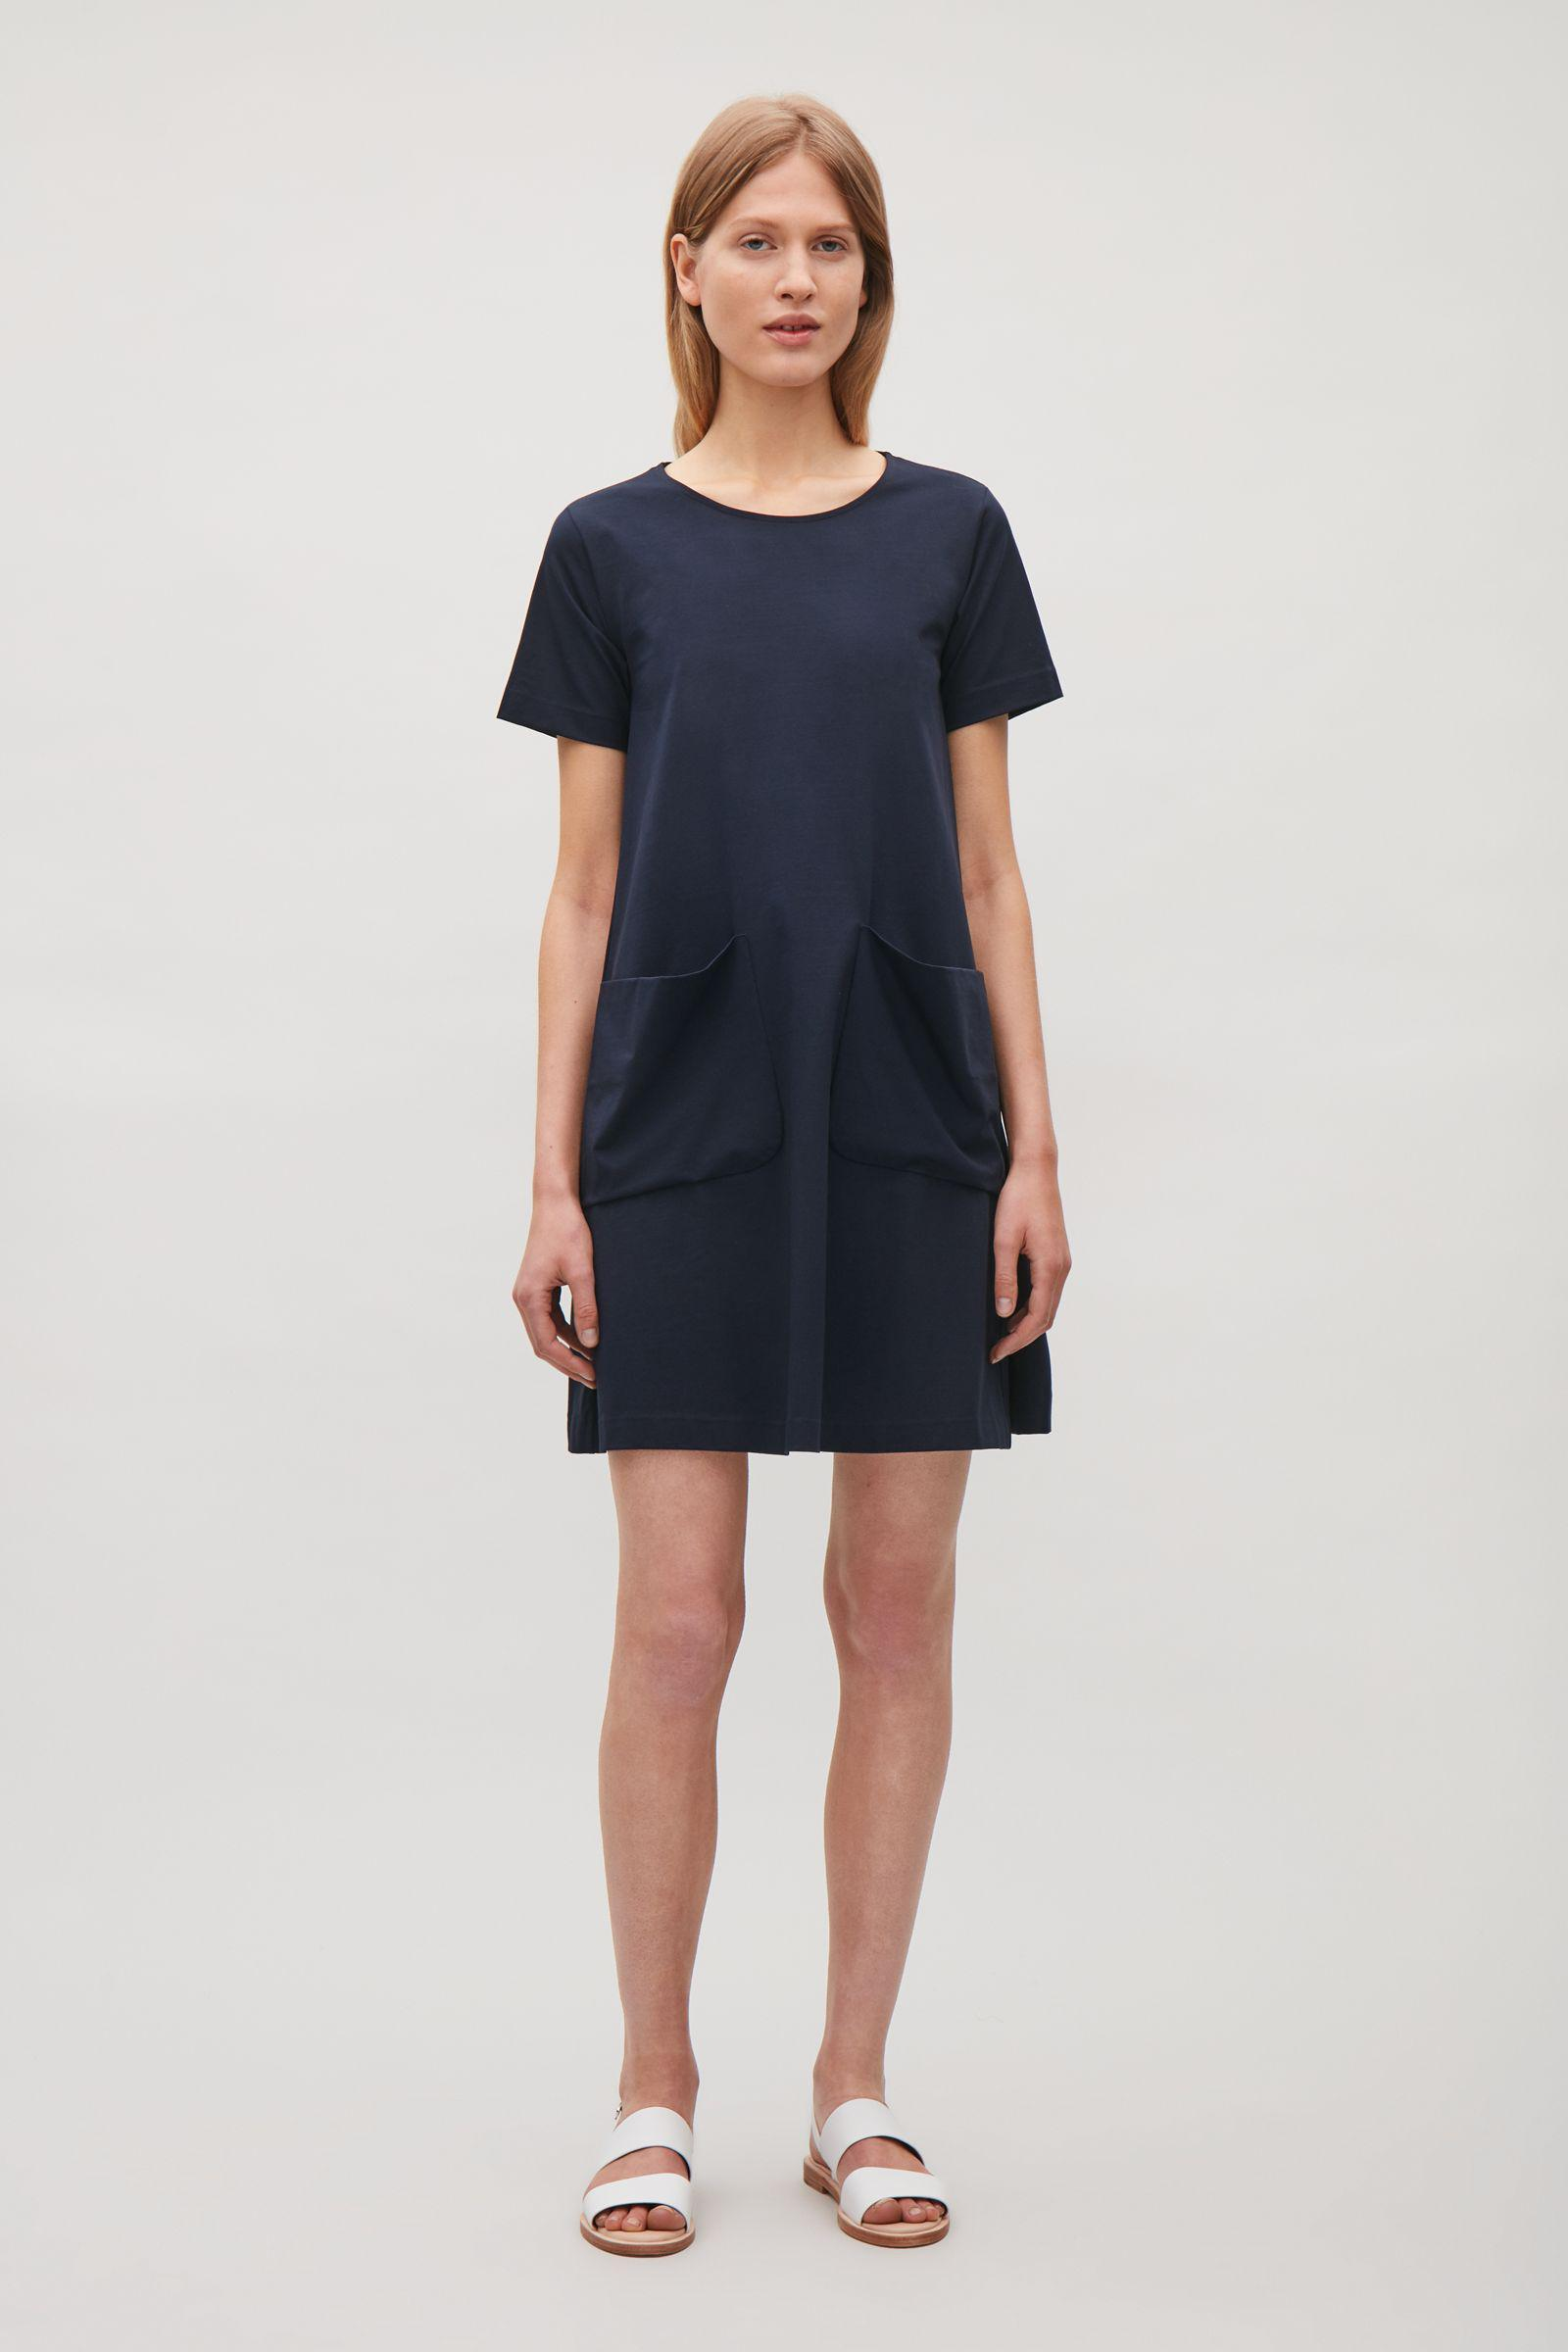 d75c0a6bcf Lyst - COS A-line Jersey Dress in Blue